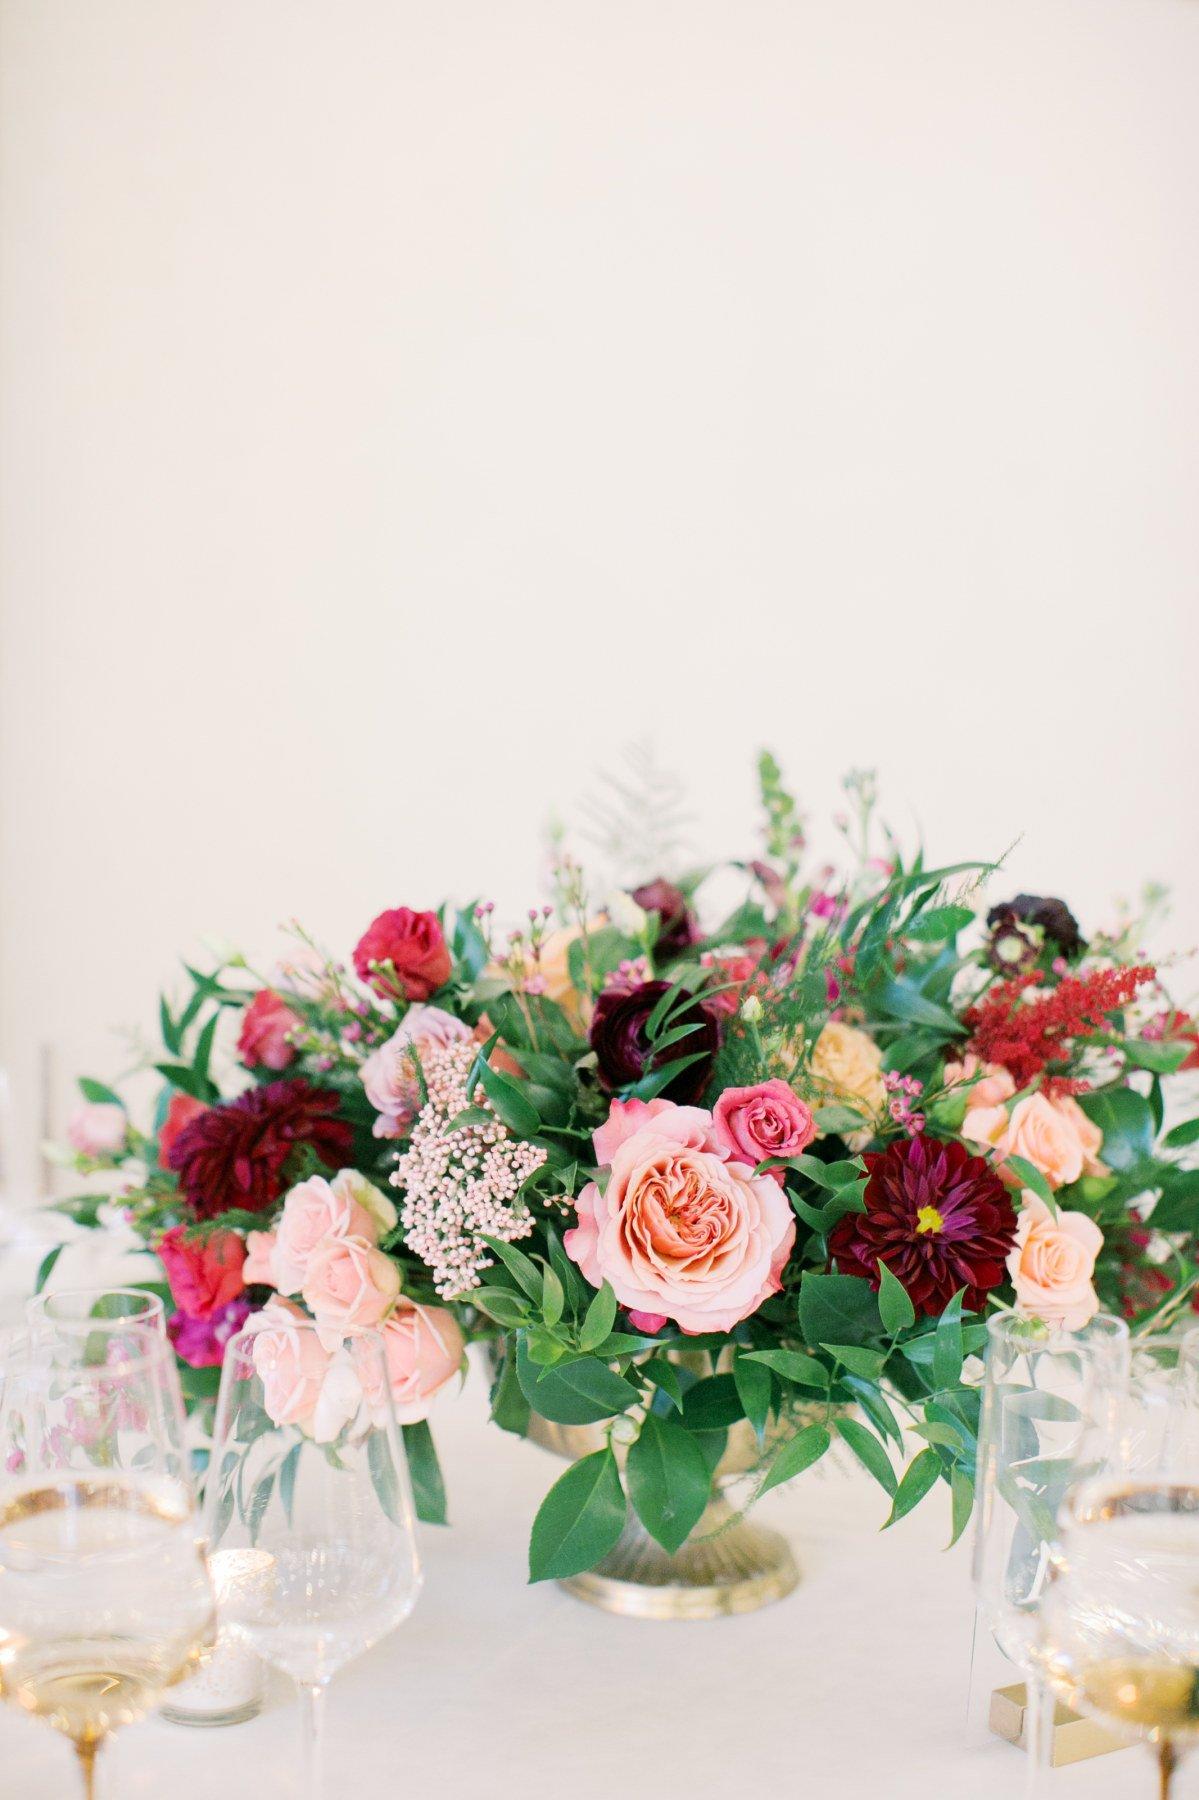 50Great_Marsh_Estates_Wedding_Anne_Kelley_Events_Astrid_PhotographyAP_02662